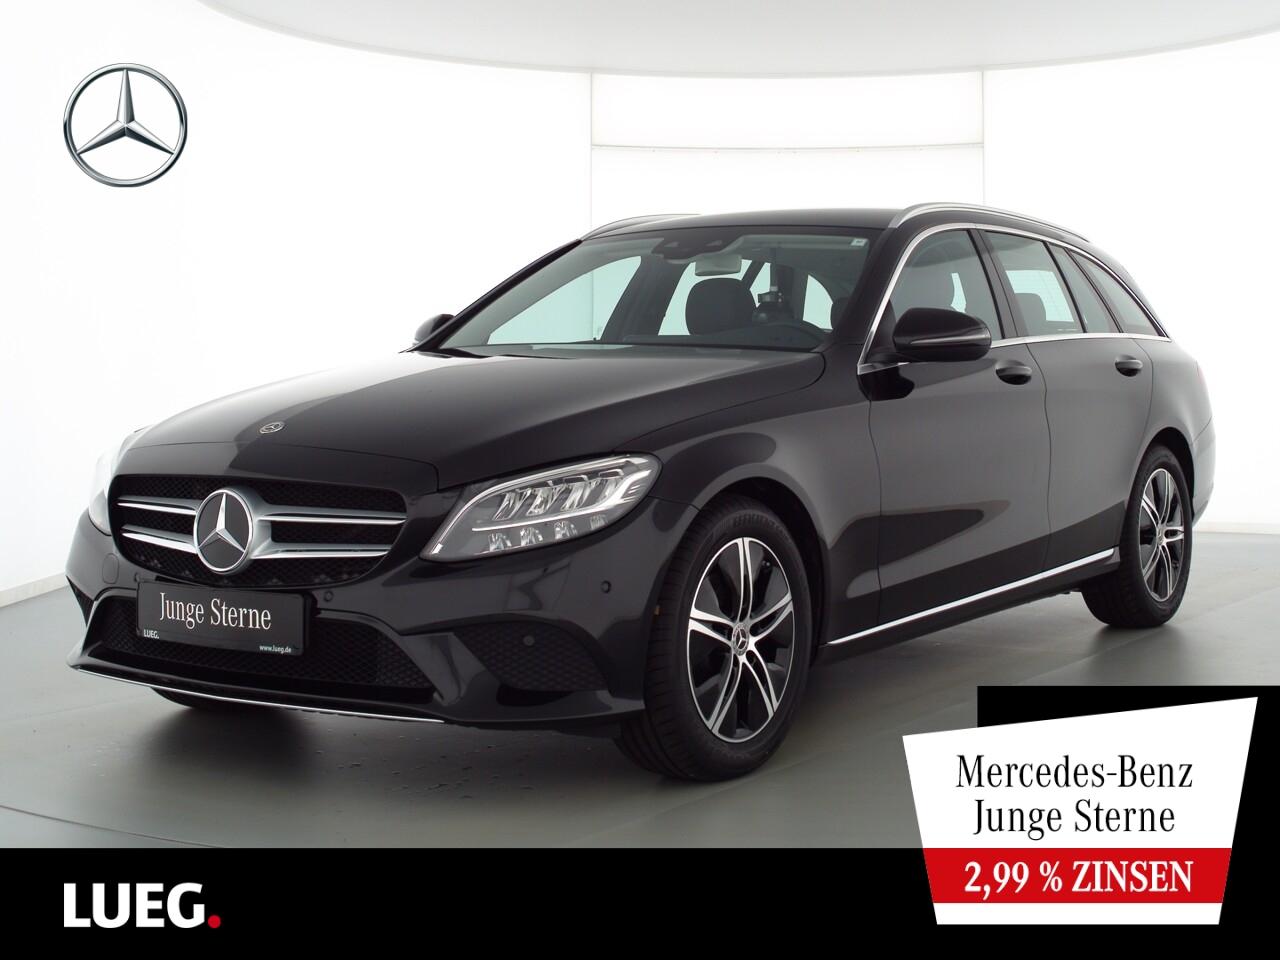 Mercedes-Benz C 180 T Avantgarde+Navi+LED-HP+SpurP+ParkAss+RFK, Jahr 2020, Benzin